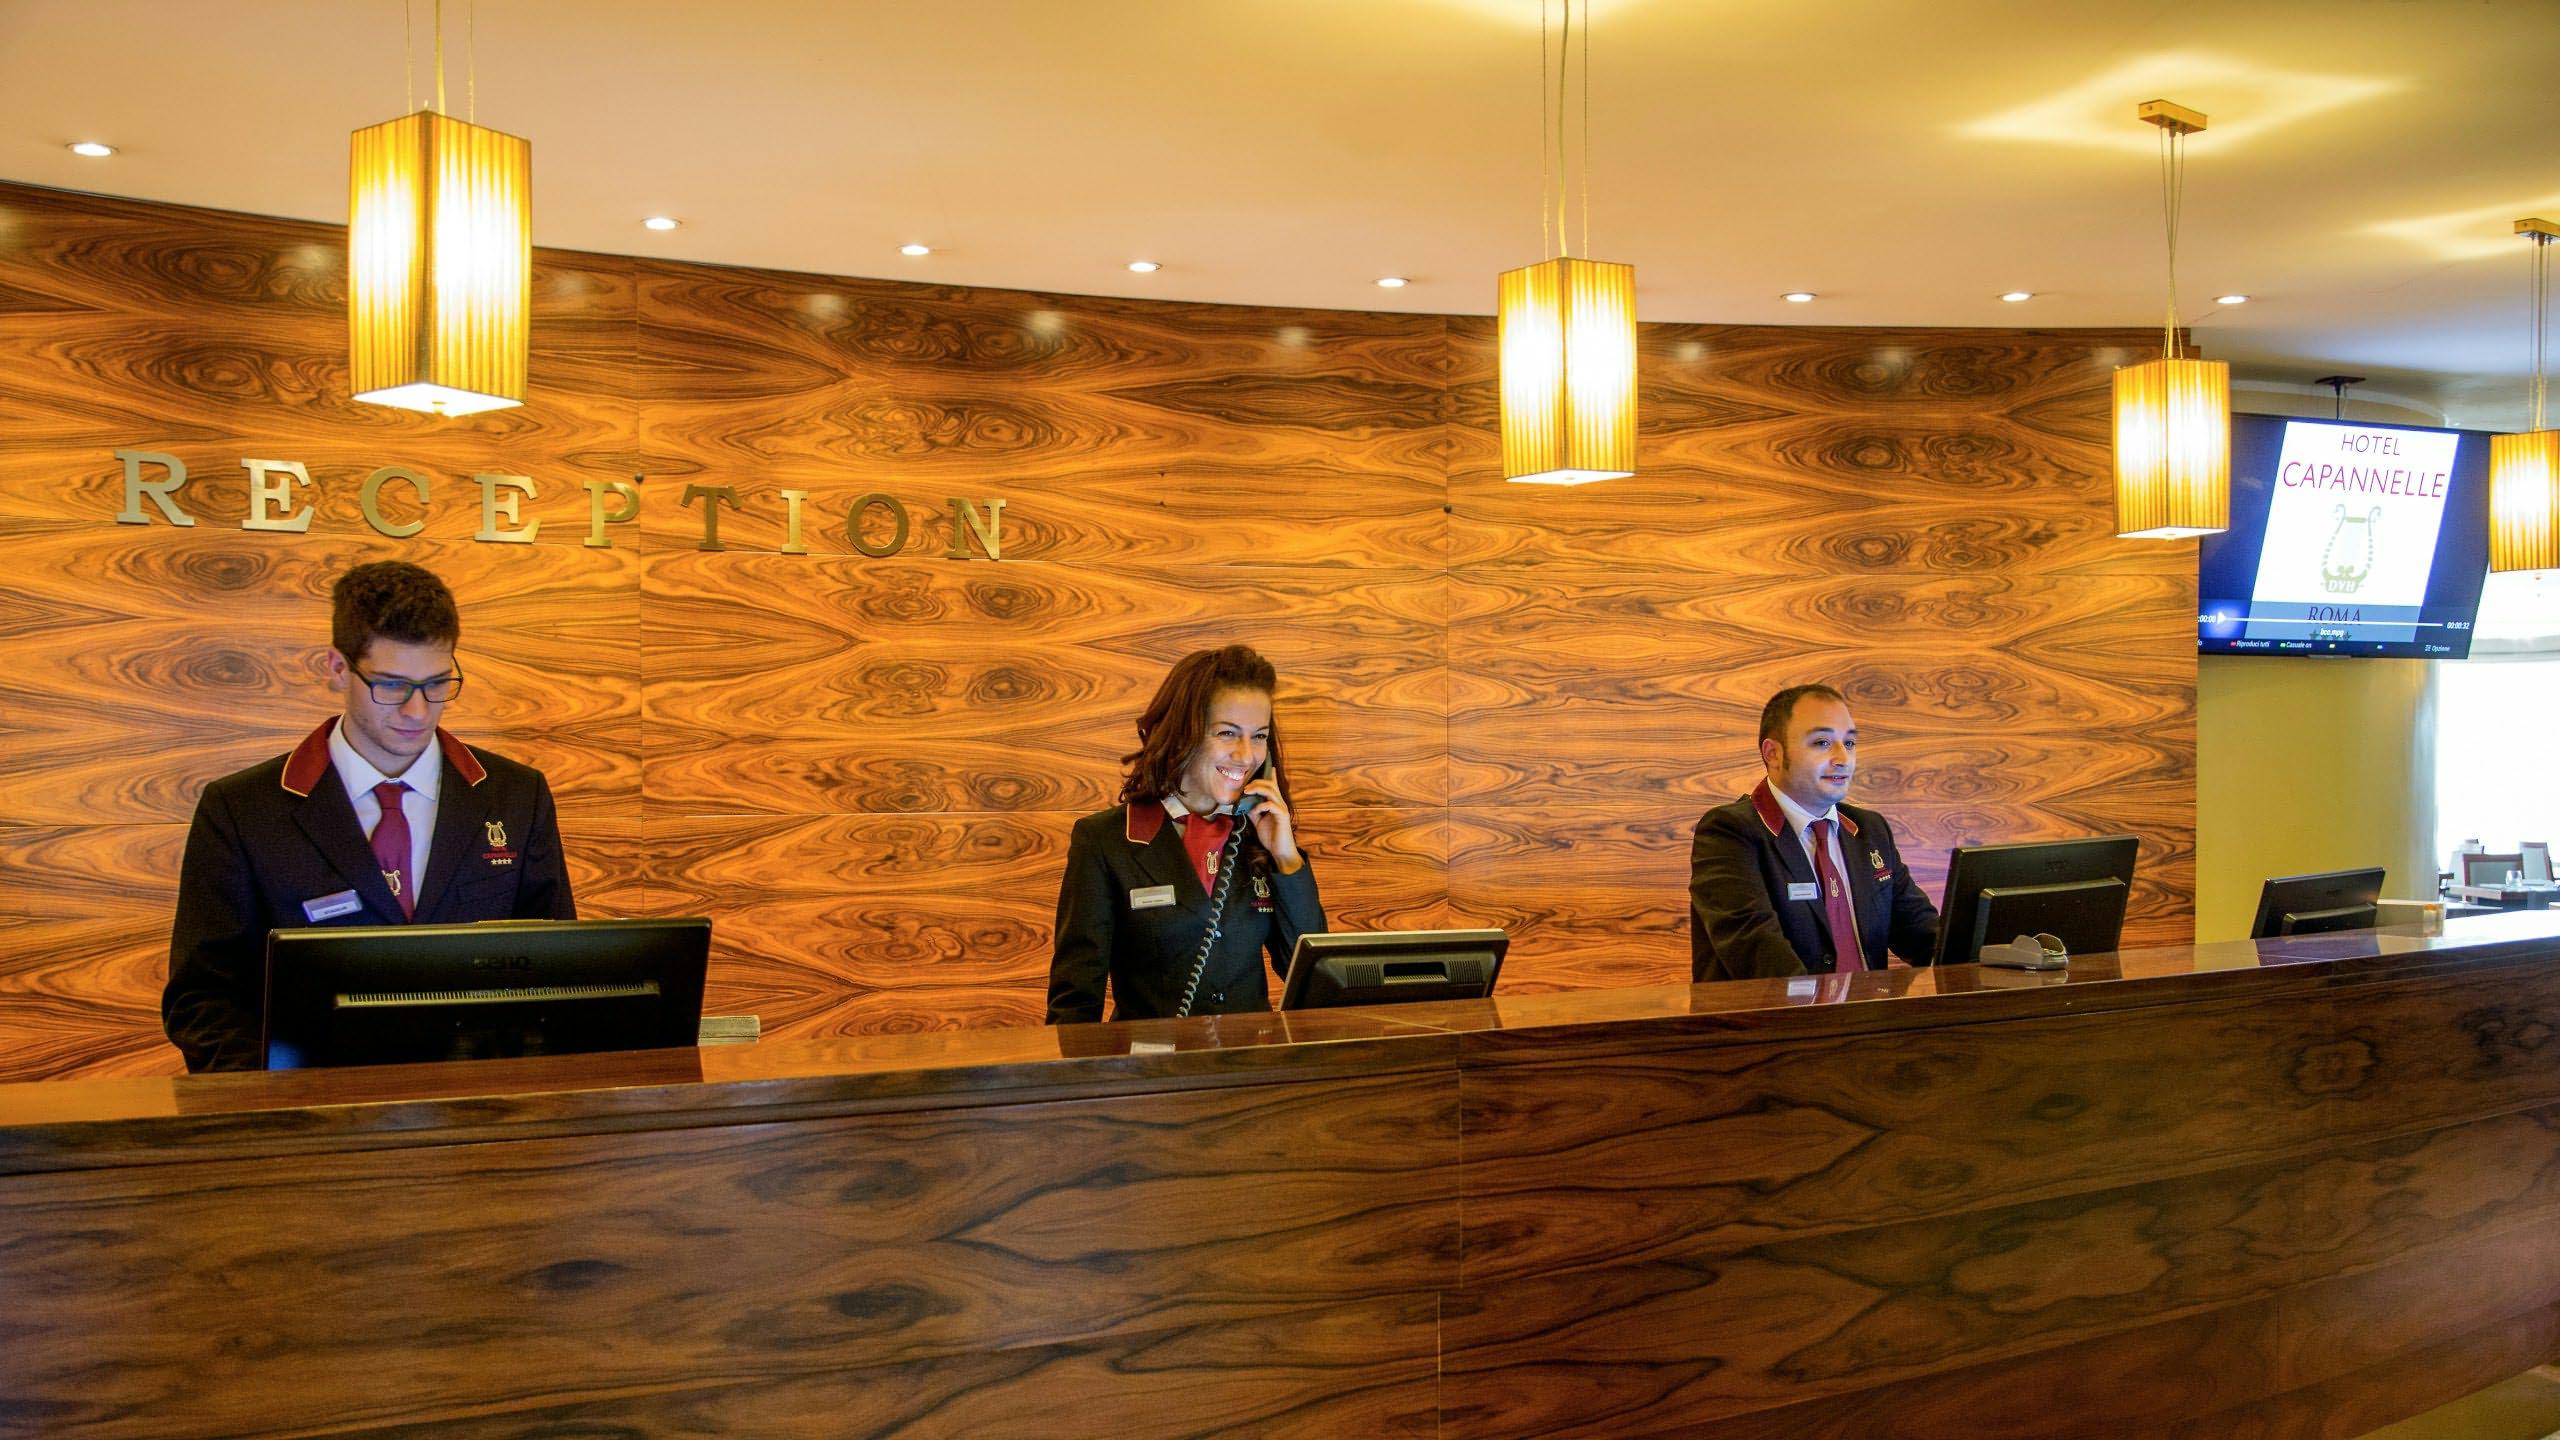 hotel-capannelle-rome-commonareas-01